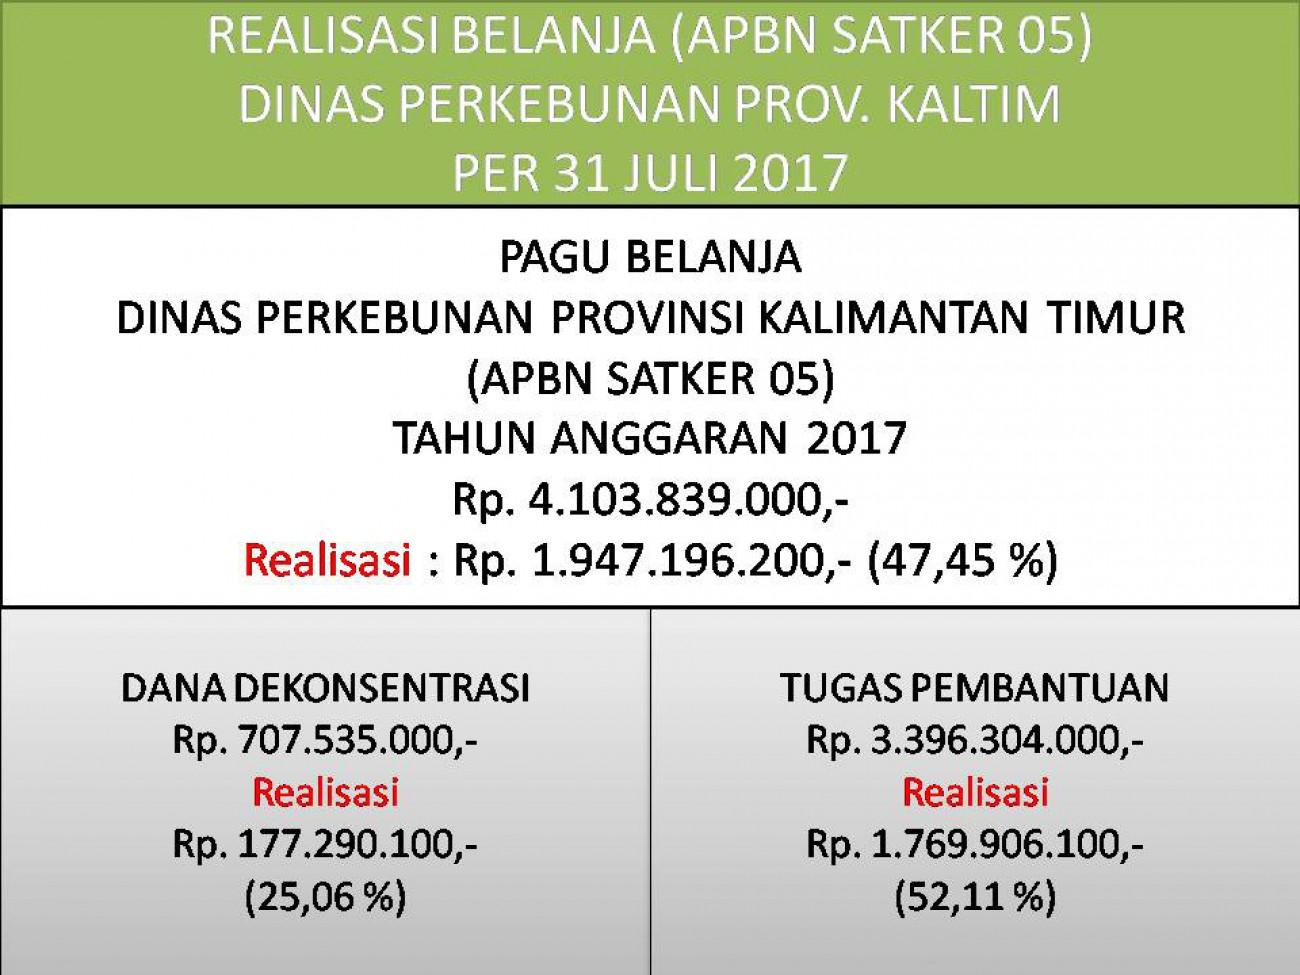 Laporan Realisasi APBN Satker 05 (Direktorat Jenderal Perkebunan) Dinas Perkebunan Prov. Kaltim Bulan Juli 2017